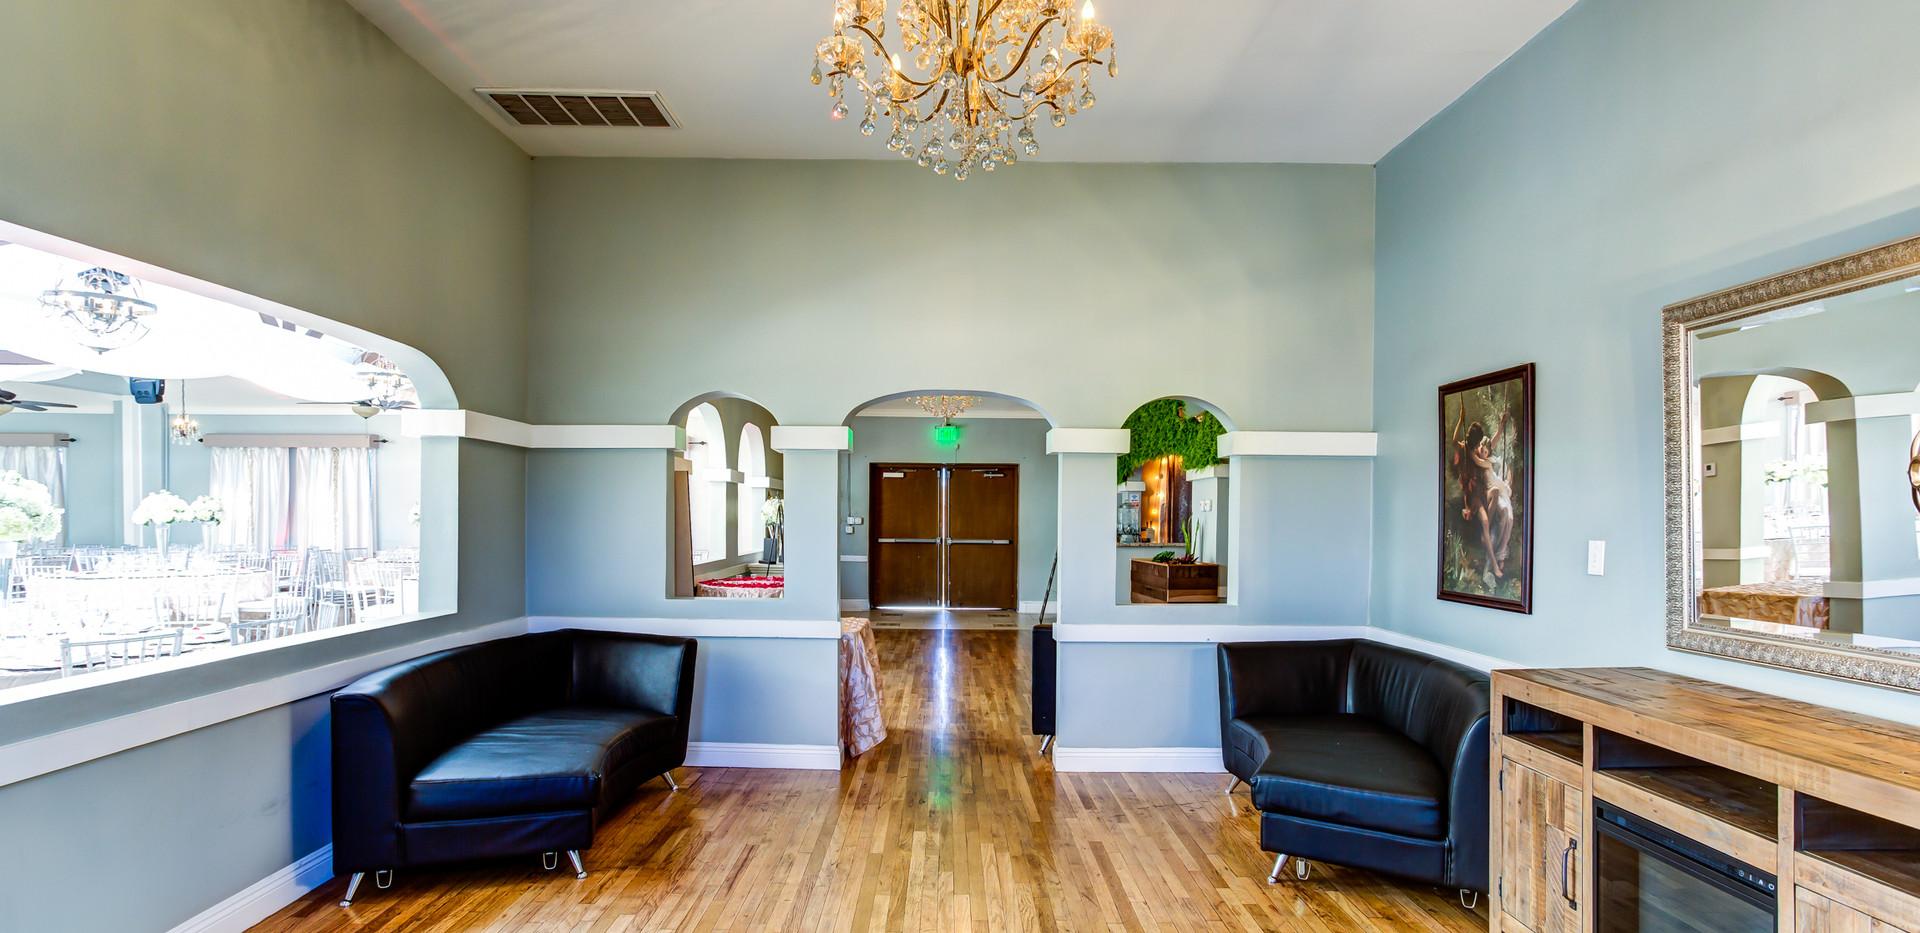 Atlantis Banquet Hall lounge area